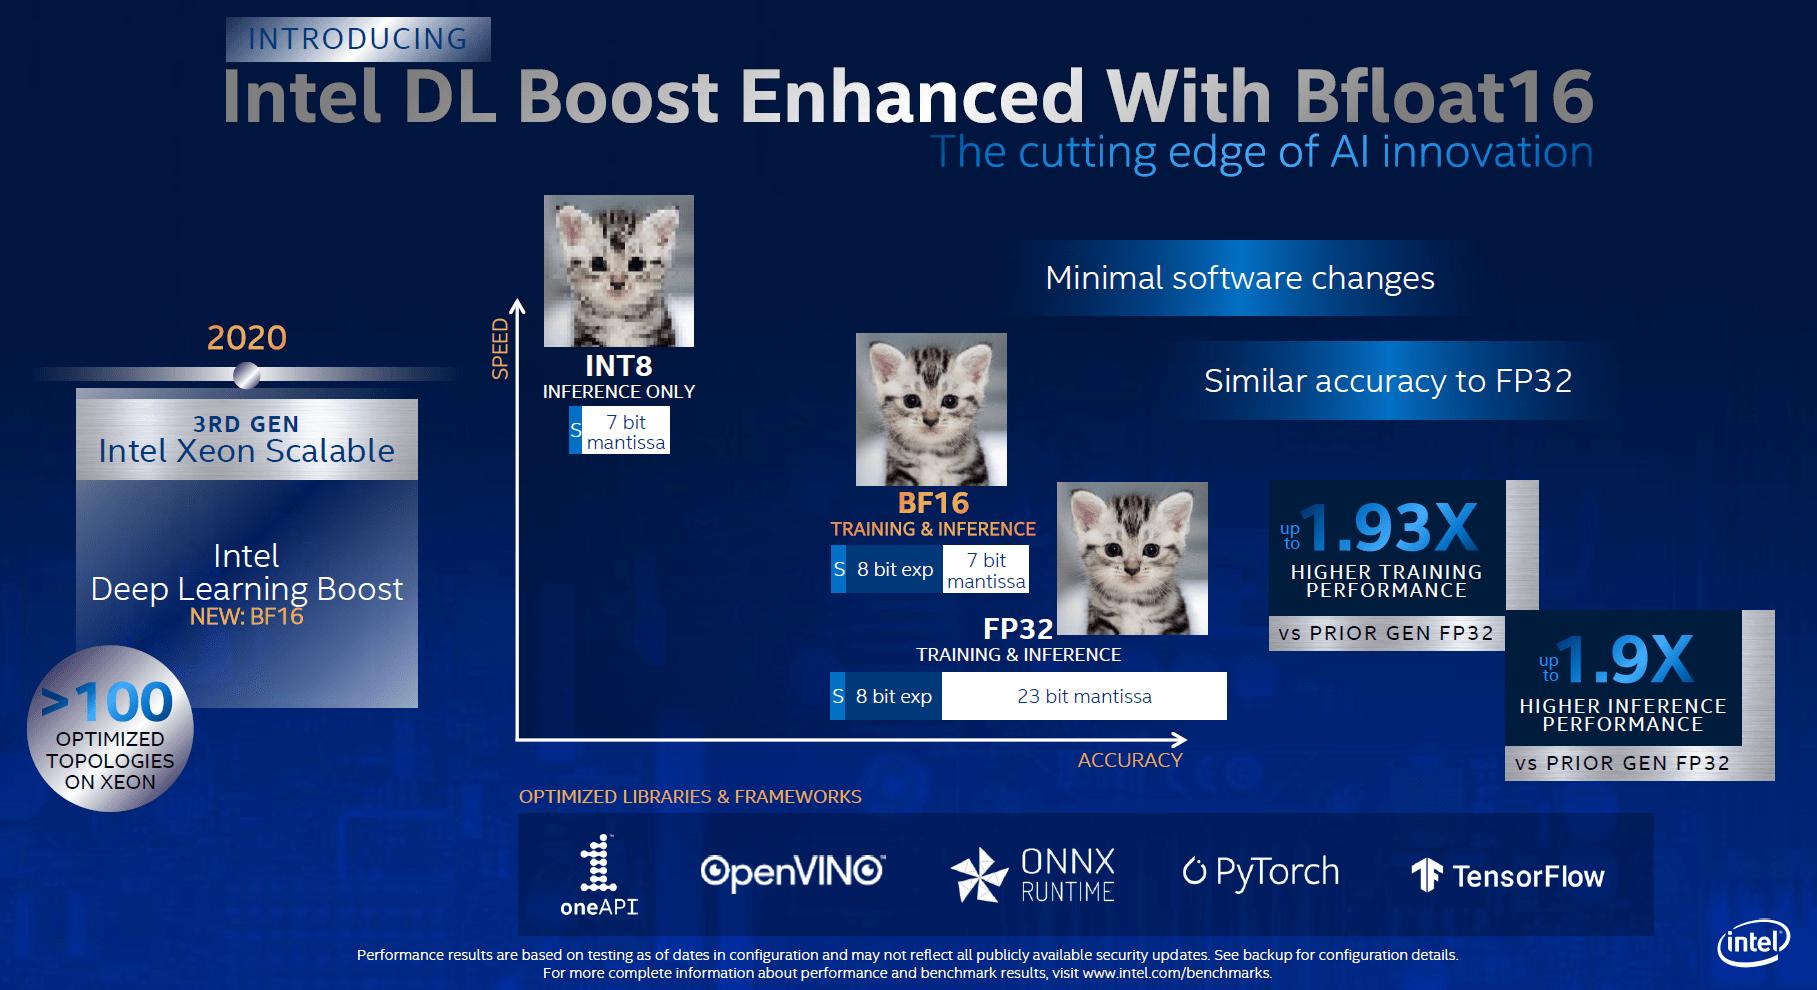 Intel DL Boost mit bfloat16